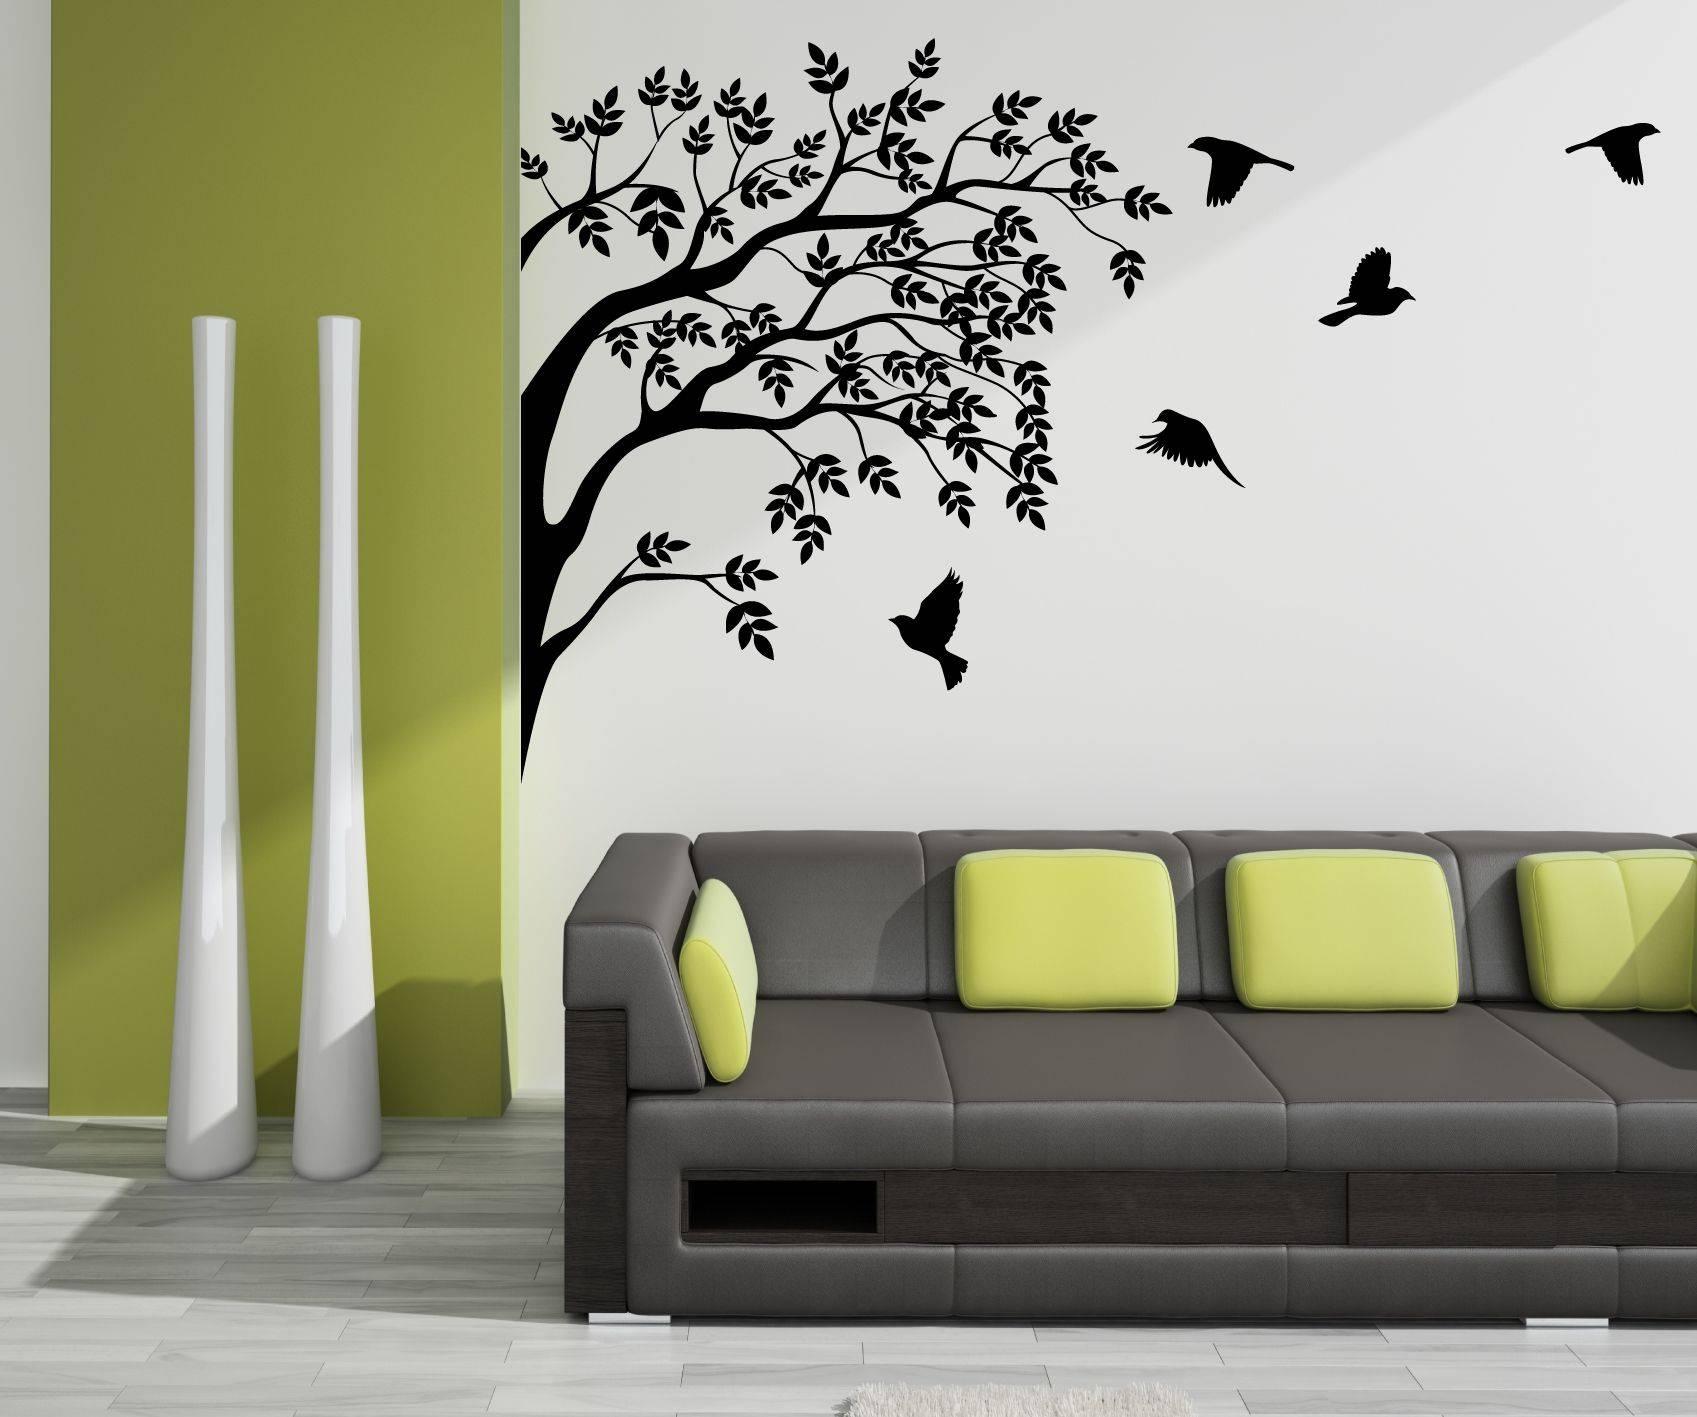 Wall Art Designs: Vinyl Wall Art Flock Of Birds In A Tree Vinyl Throughout Newest Vinyl Wall Art Tree (View 7 of 20)